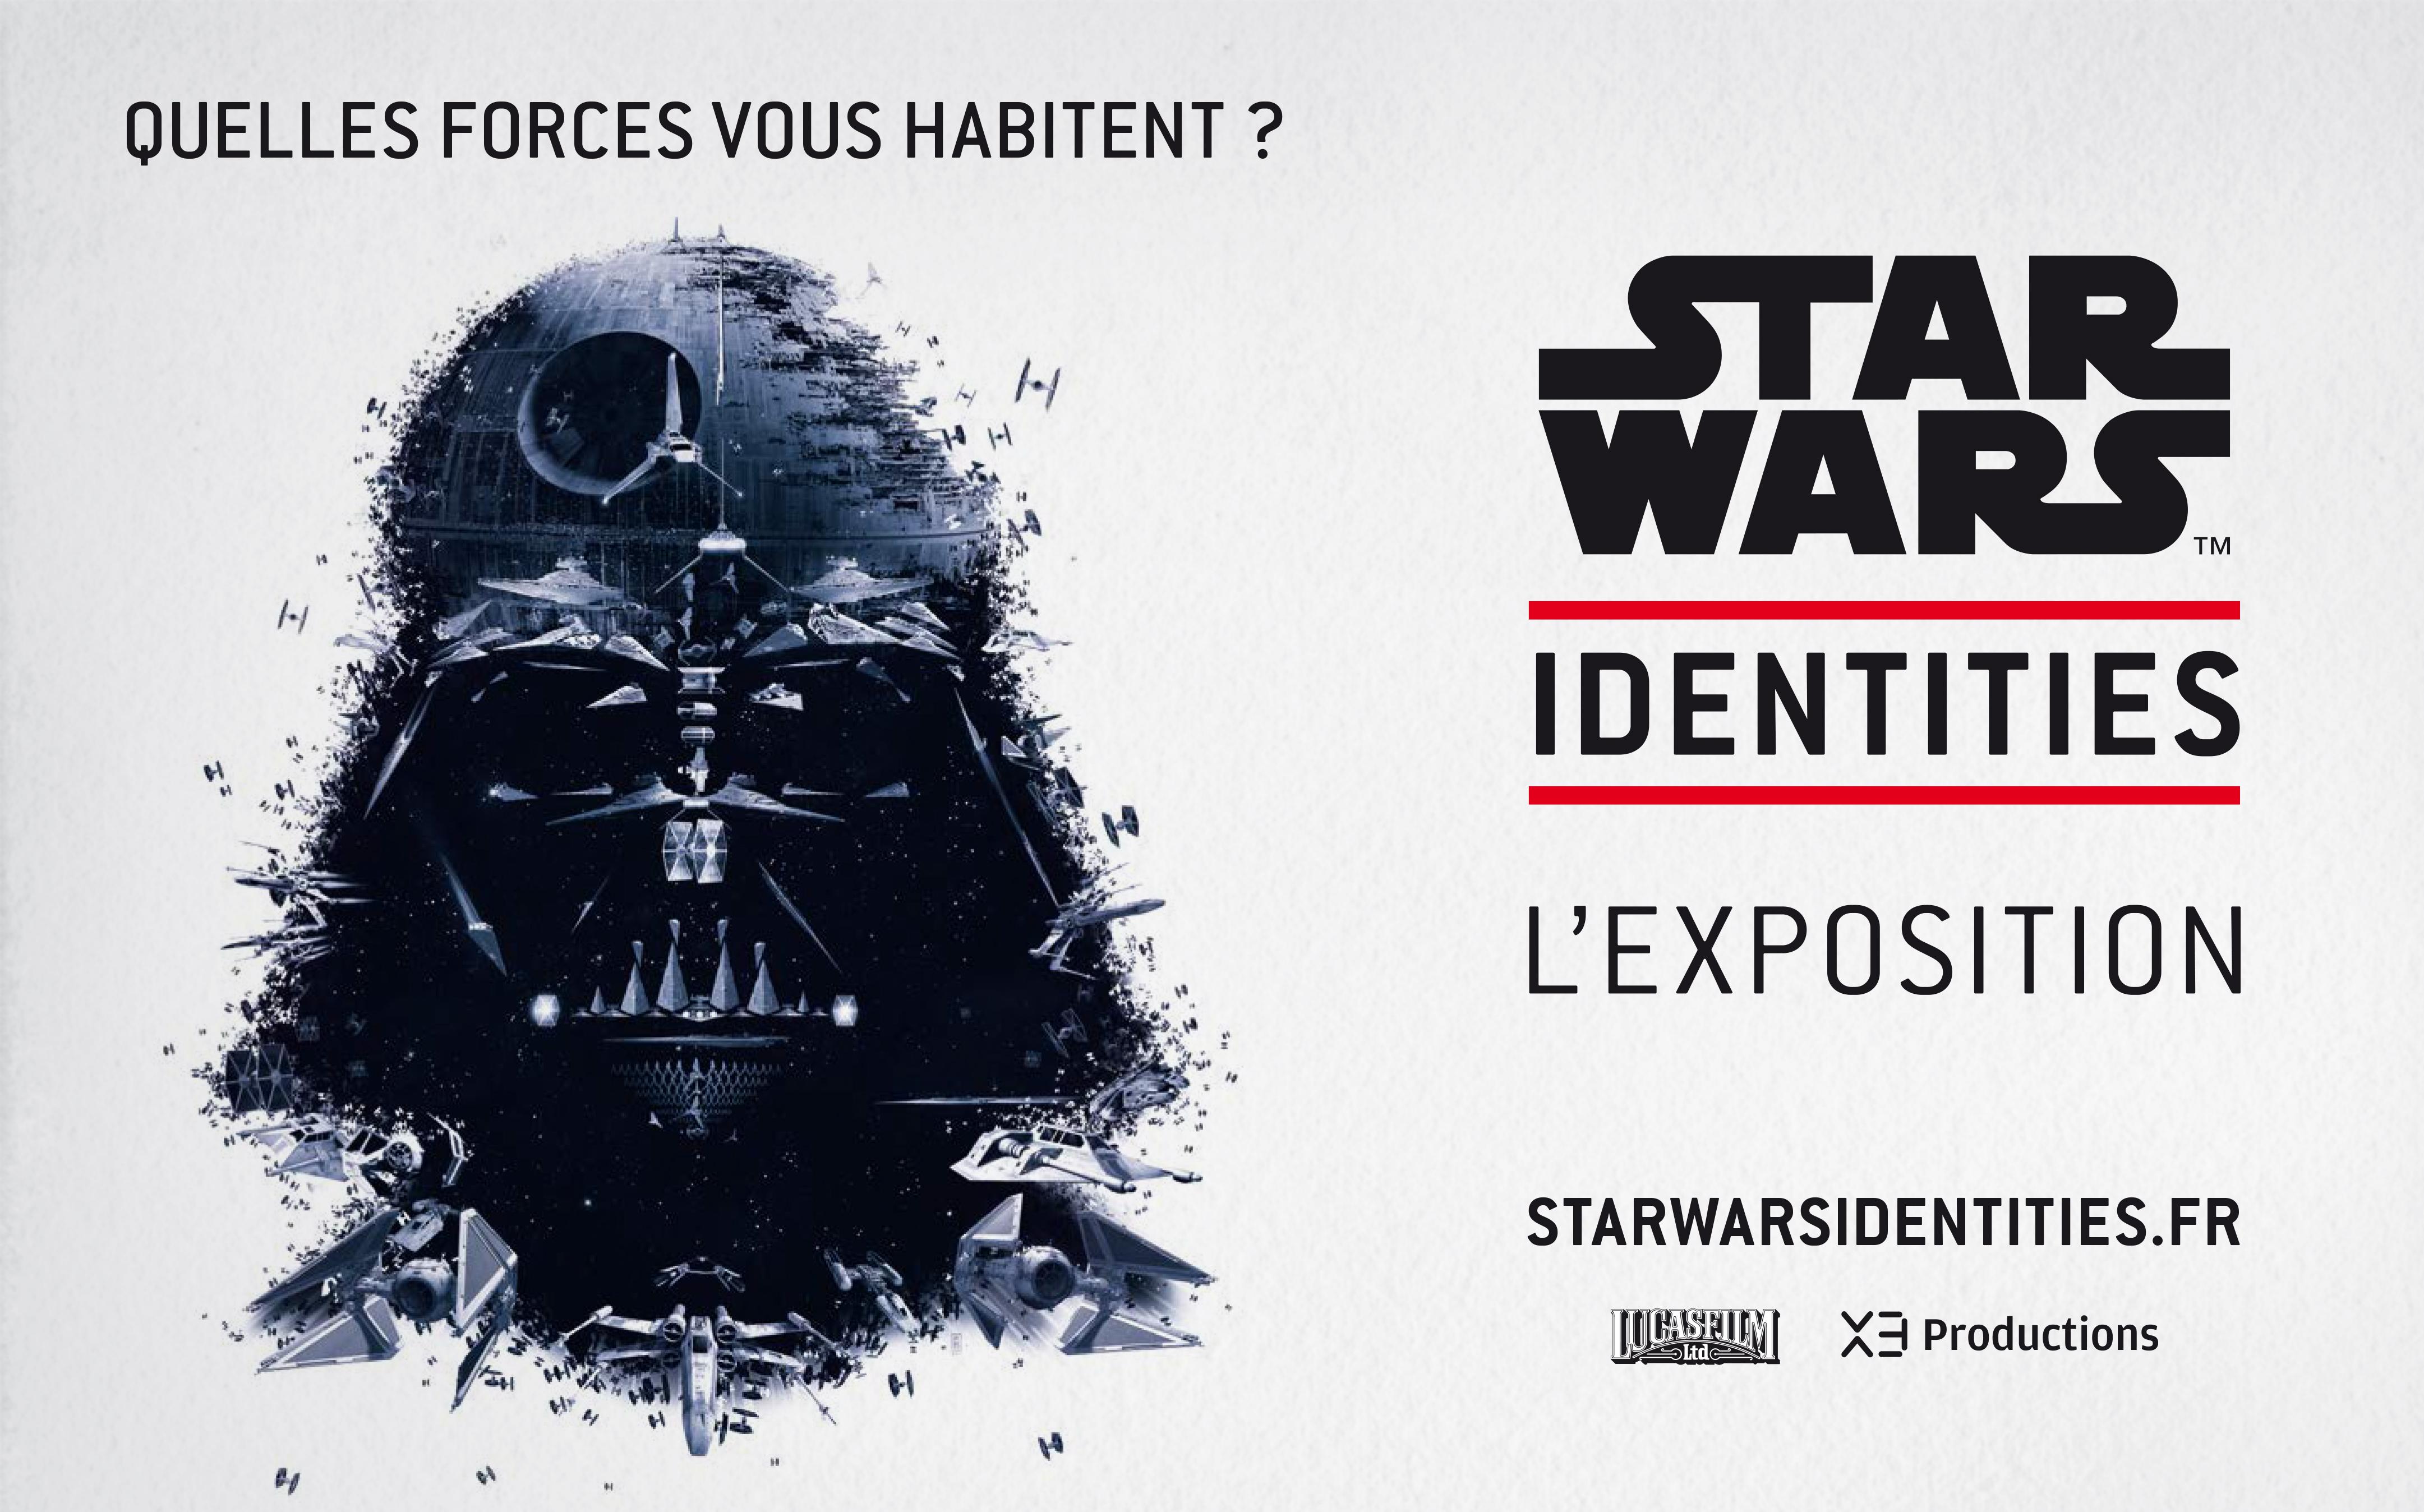 http://masemainecinema.files.wordpress.com/2014/03/7769398251_l-exposition-star-wars-identites.jpg